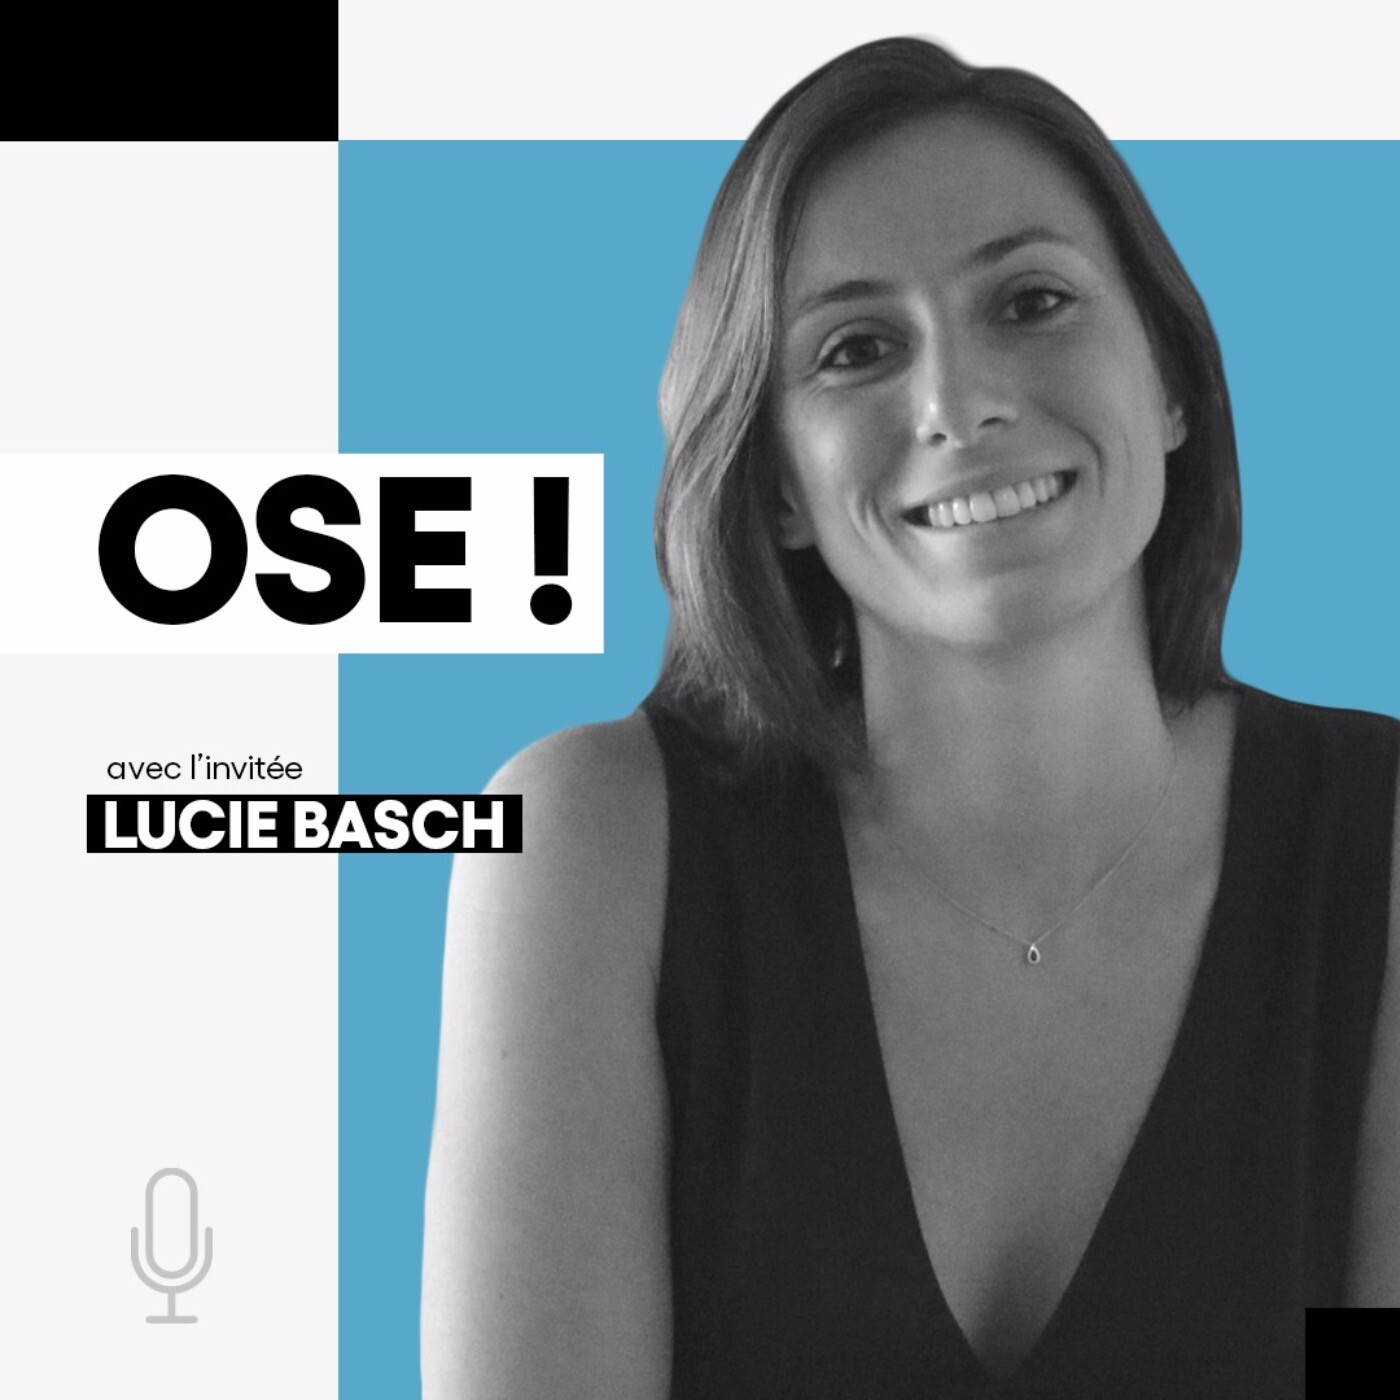 Lucie Basch, Entrepreneure, cofondatrice de Too Good To Go